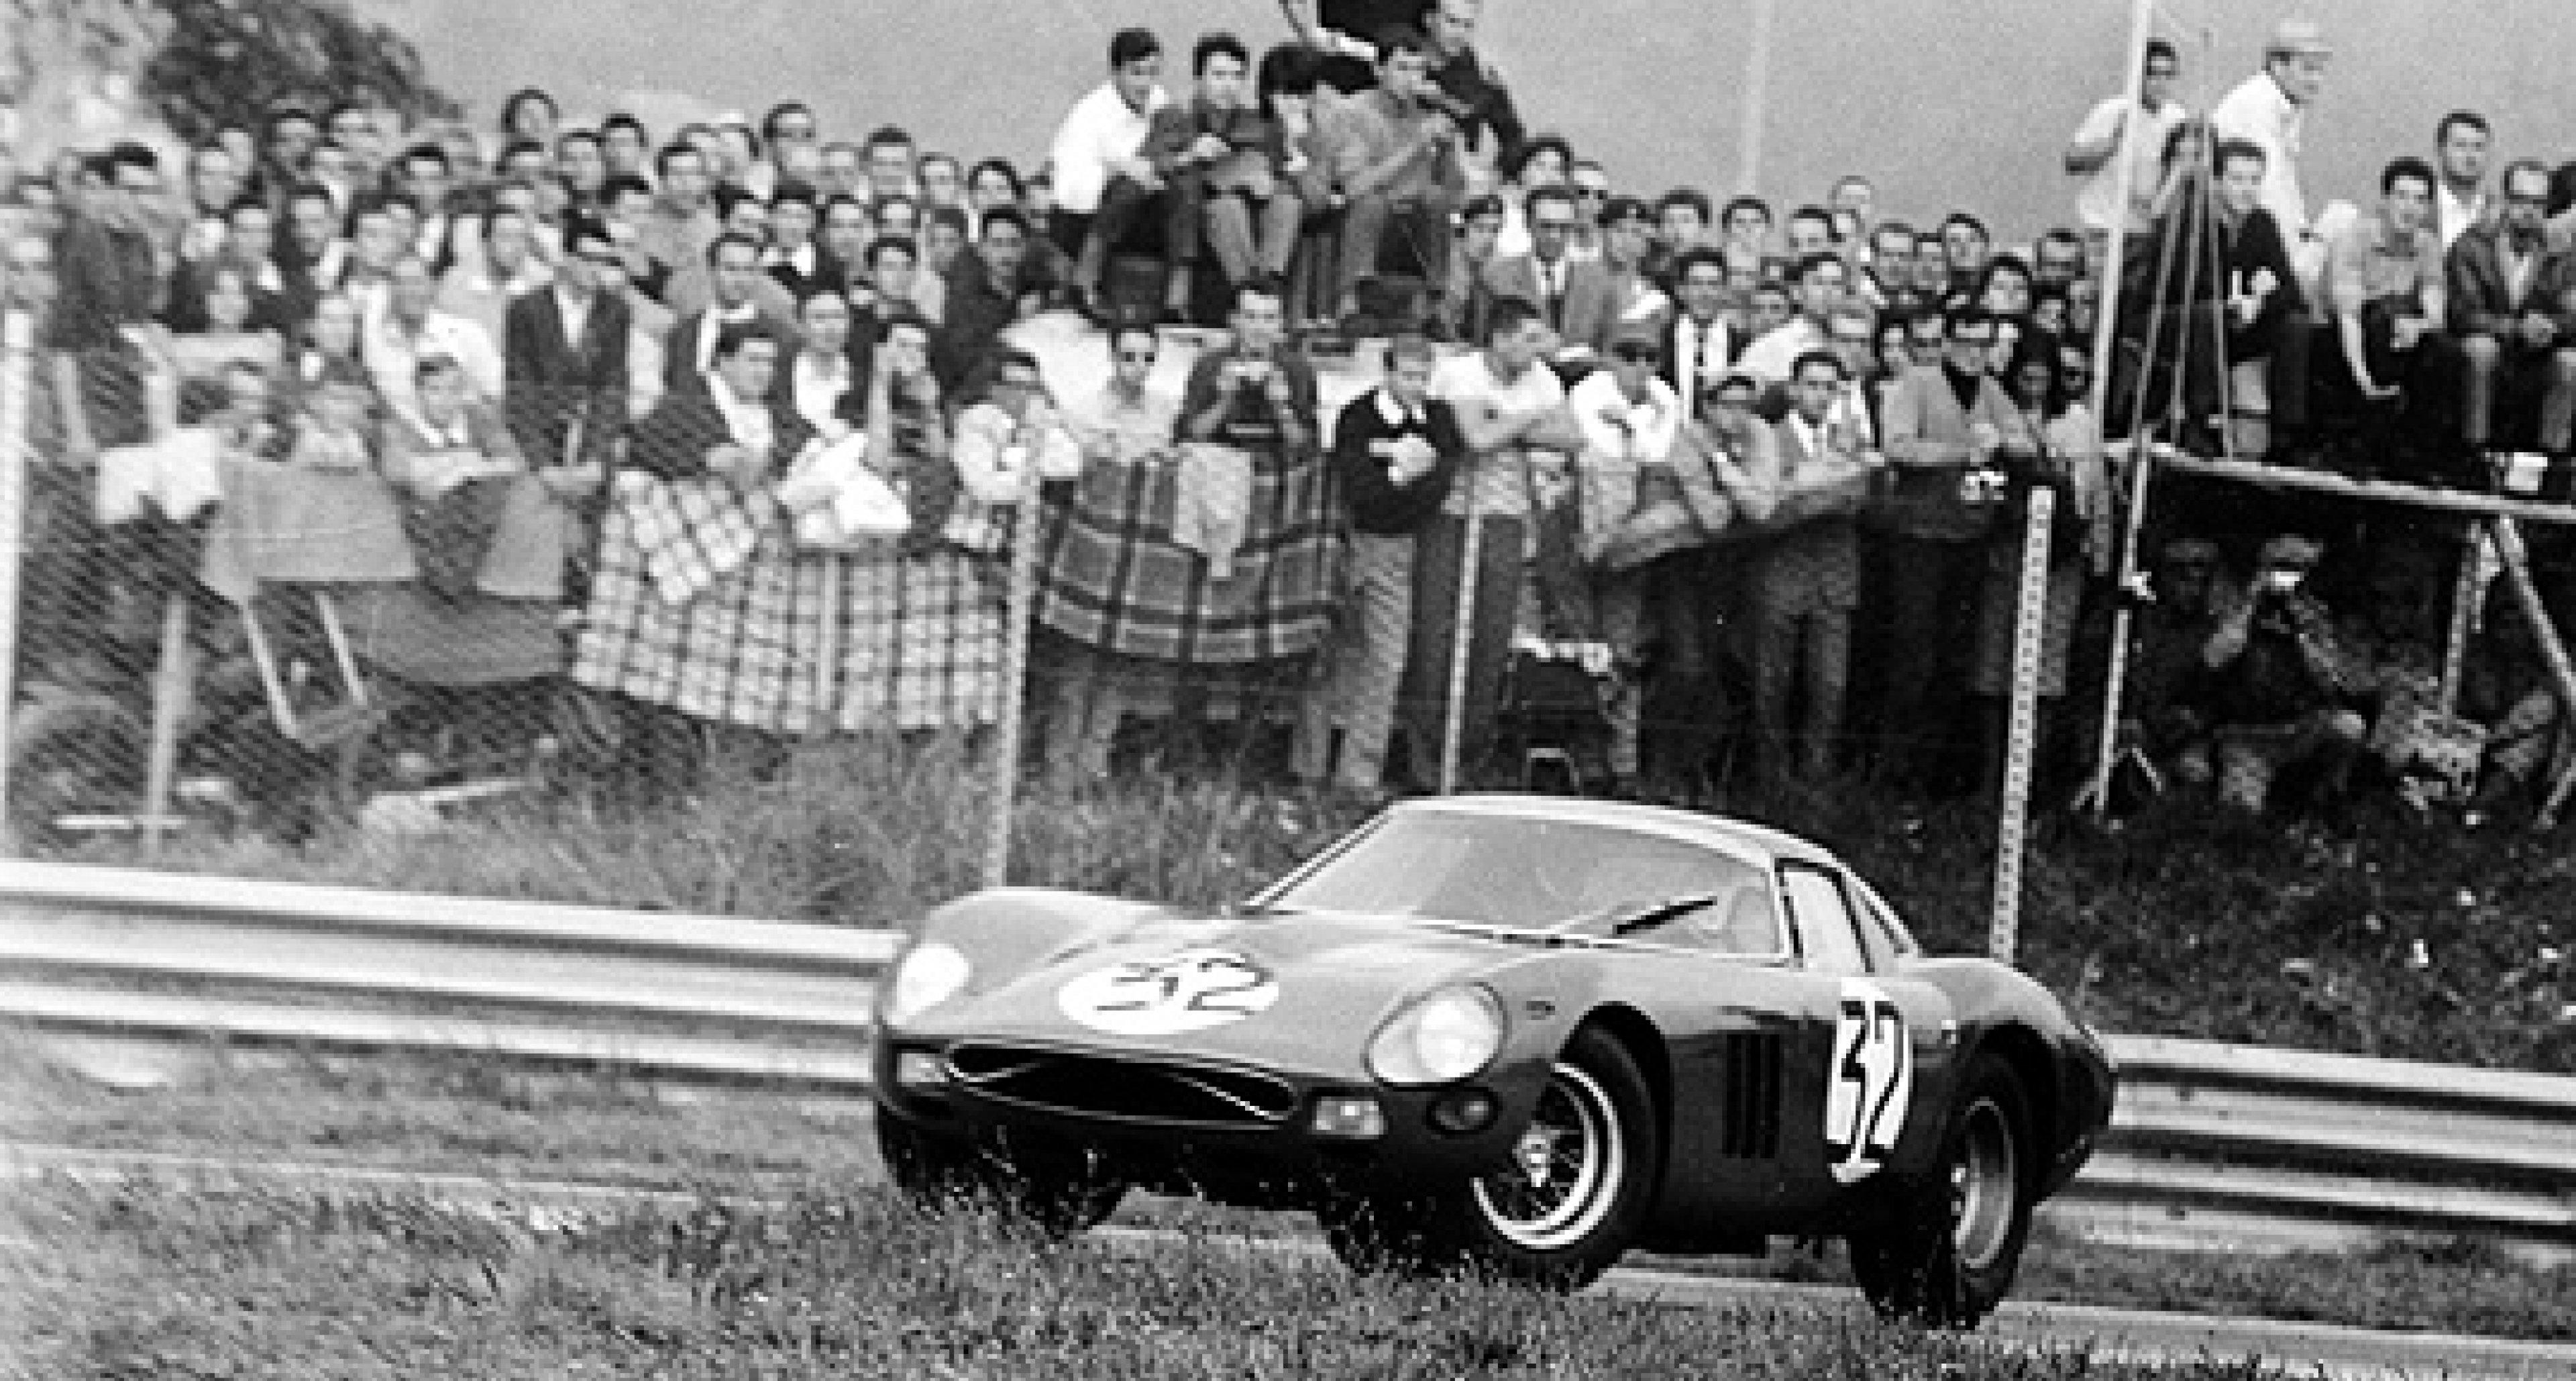 RM verkauft Ferrari 250 GTO: Neuer Preisrekord?